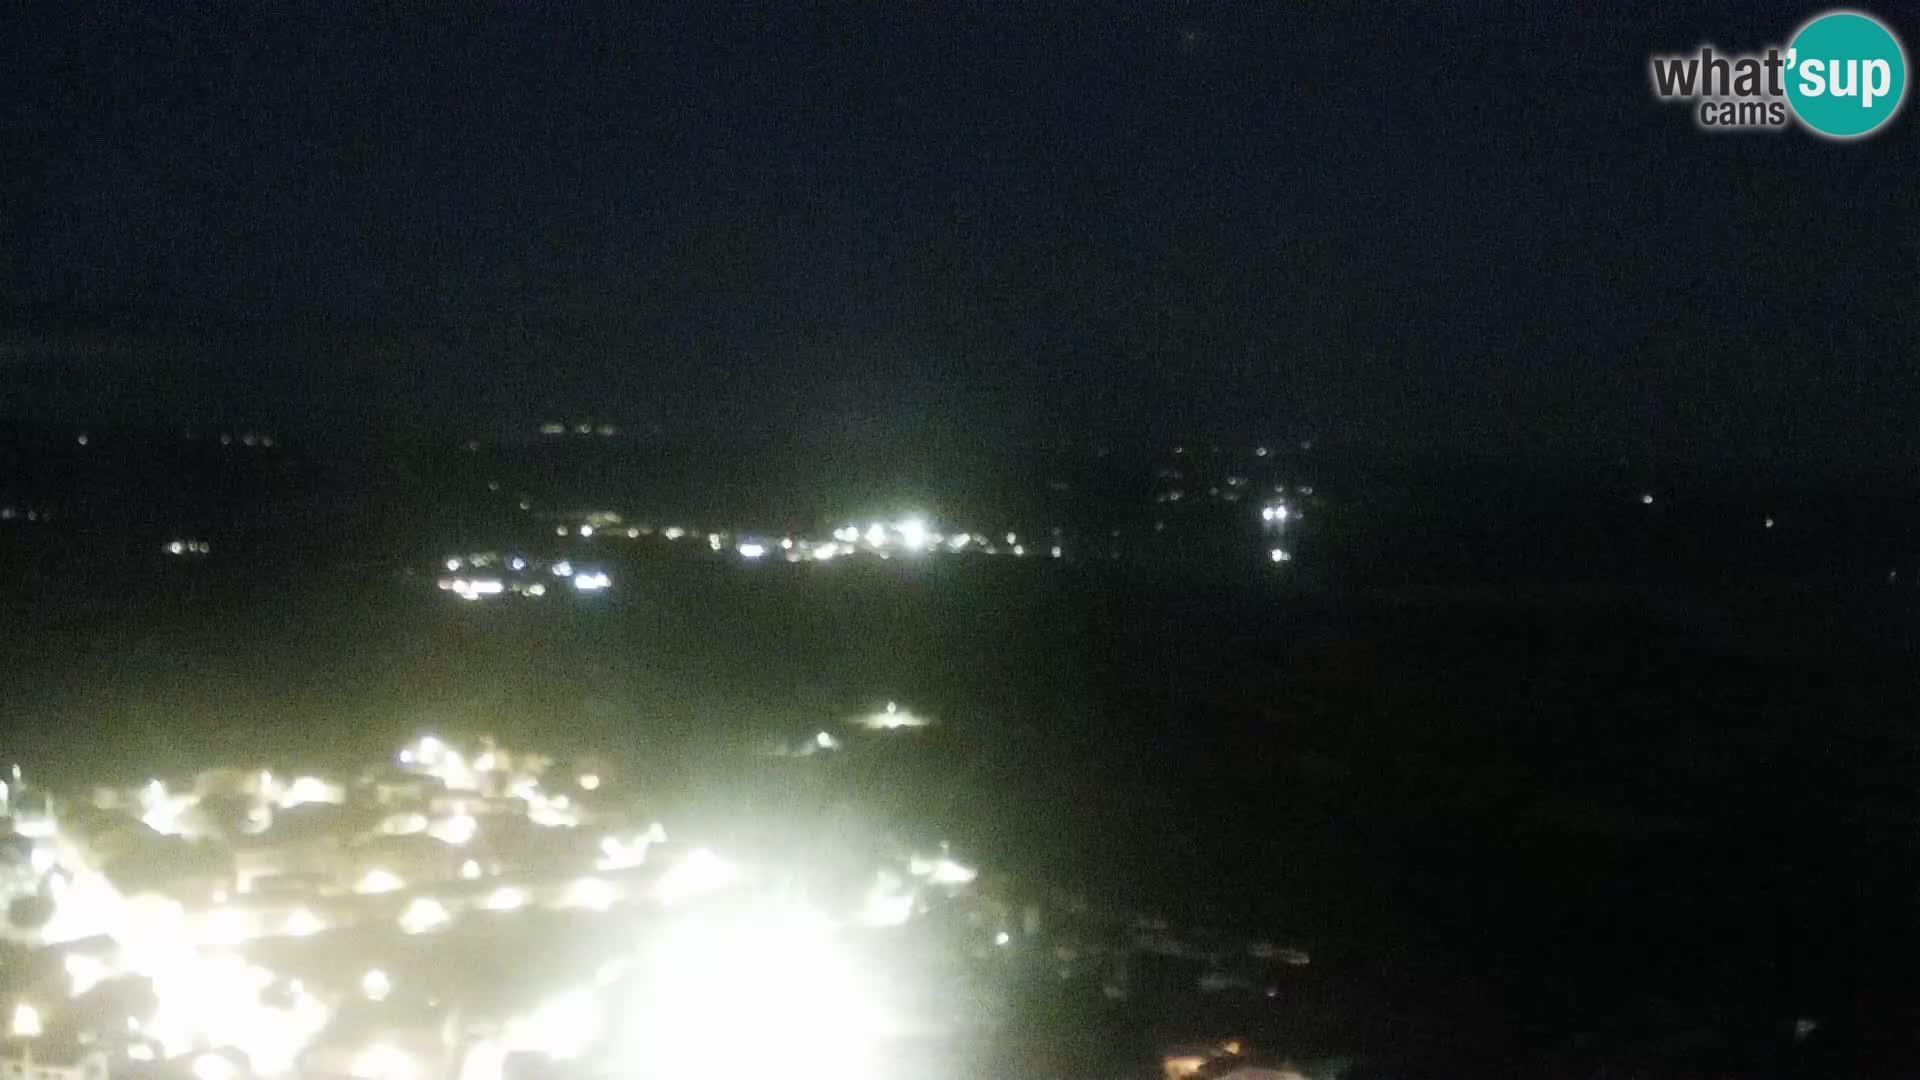 Live webcam San Pasquale – Santa Teresa Gallura – Sardinia